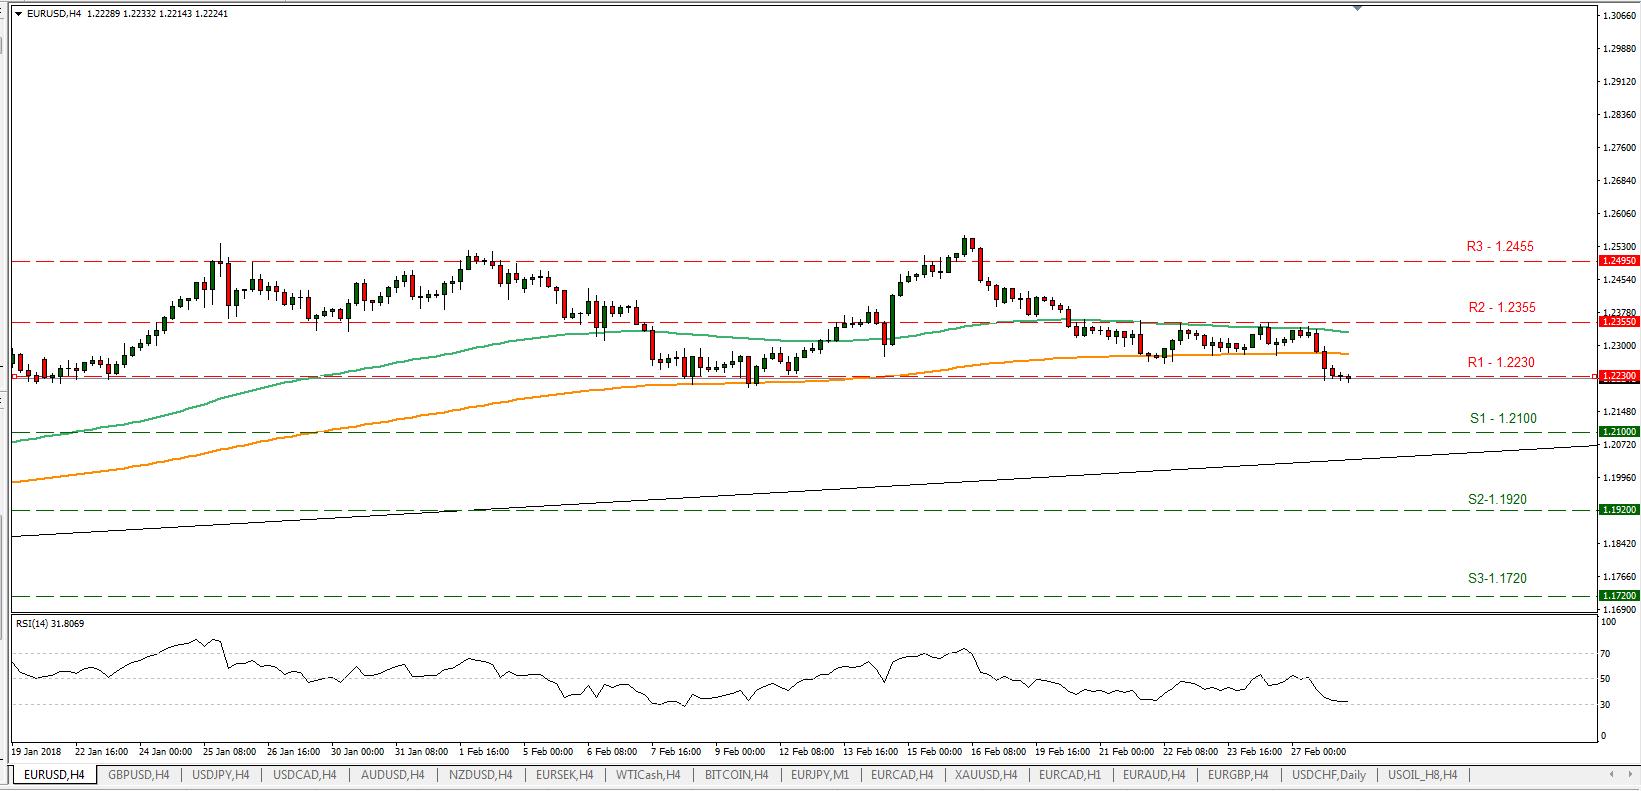 EUR/USD 28/02/2018 | EconAlerts